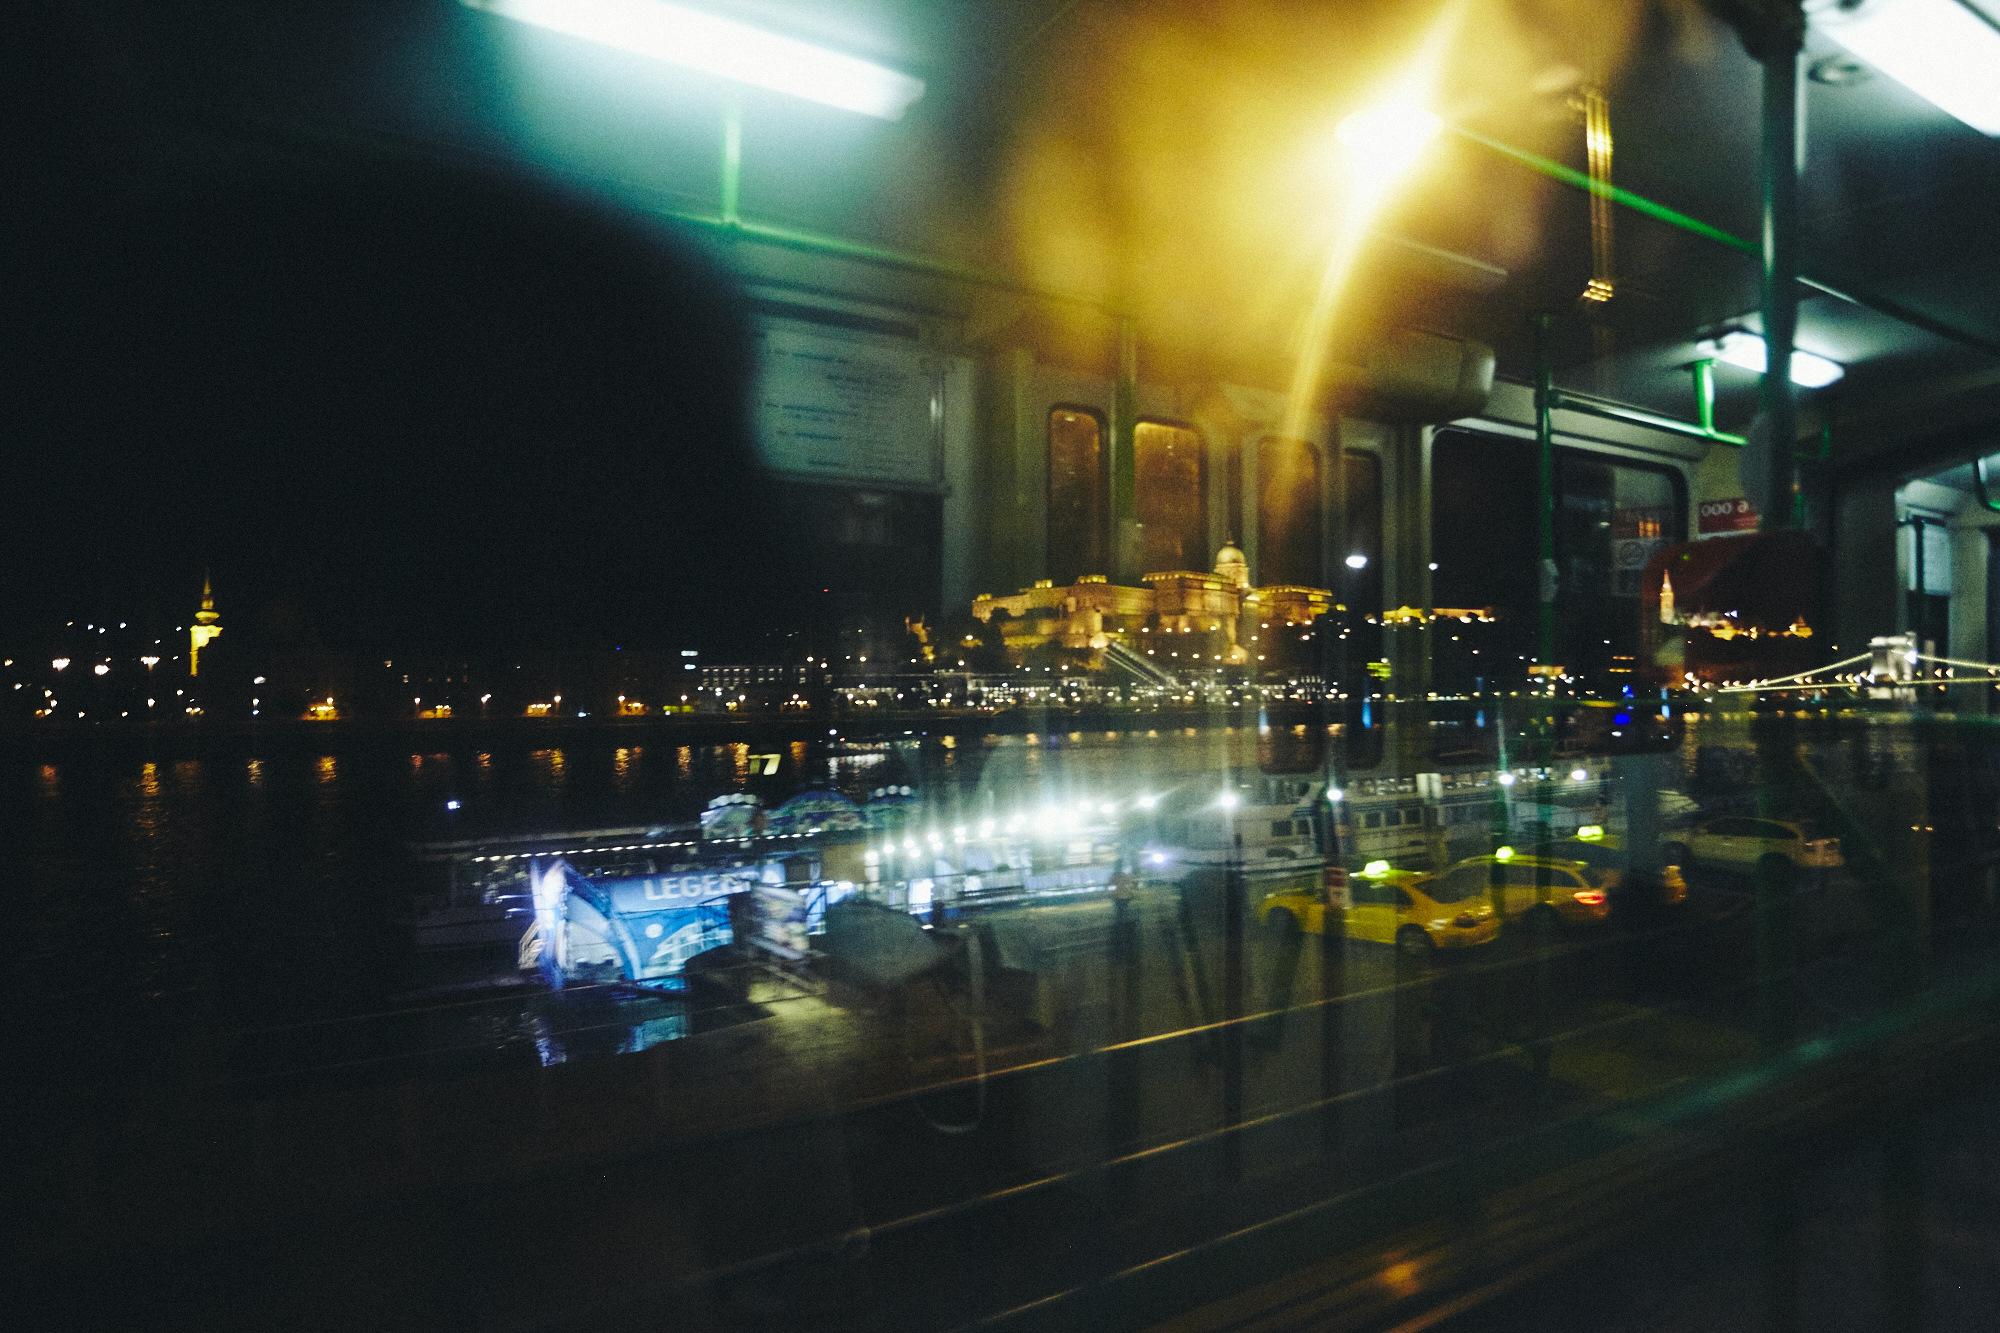 maxmotel_budapest_aug2015_day02_18_night_1757